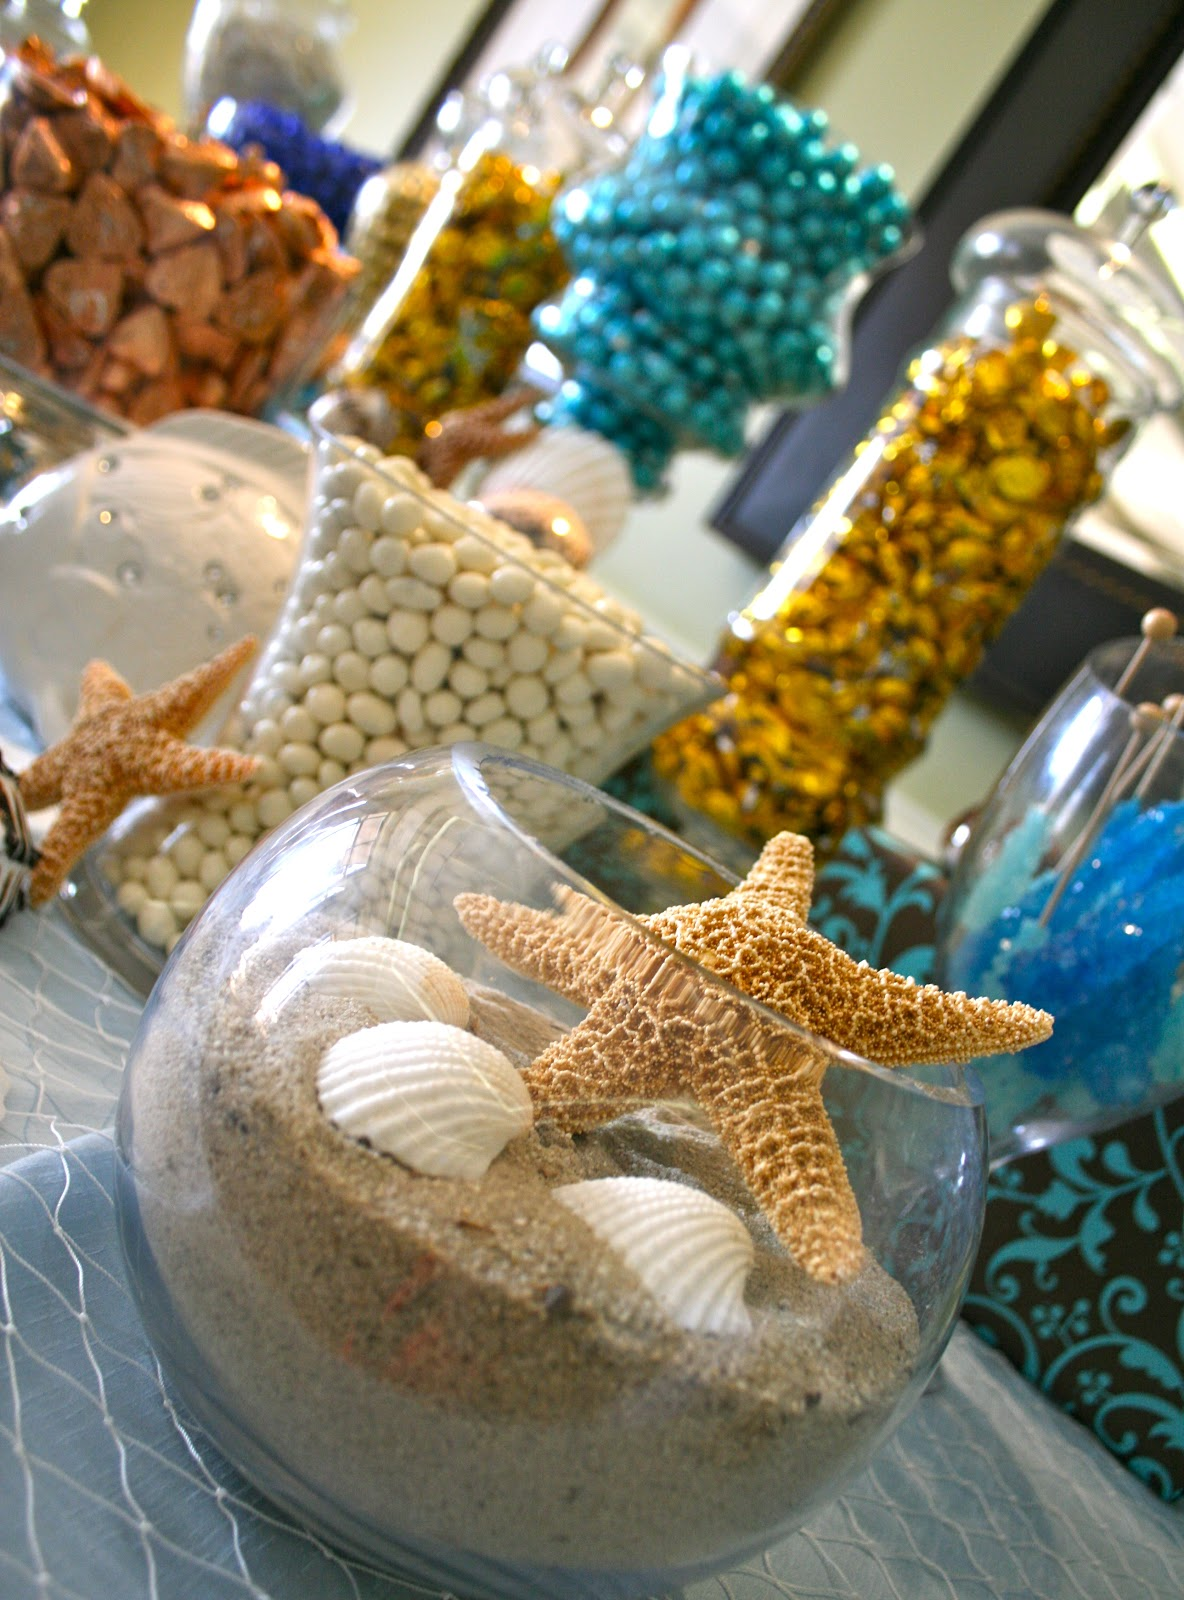 Candy S Colorado Cranker Blog Csm Tools For Cranking: Huntington Beach Nautical Beach Chic Wedding! A Beautiful